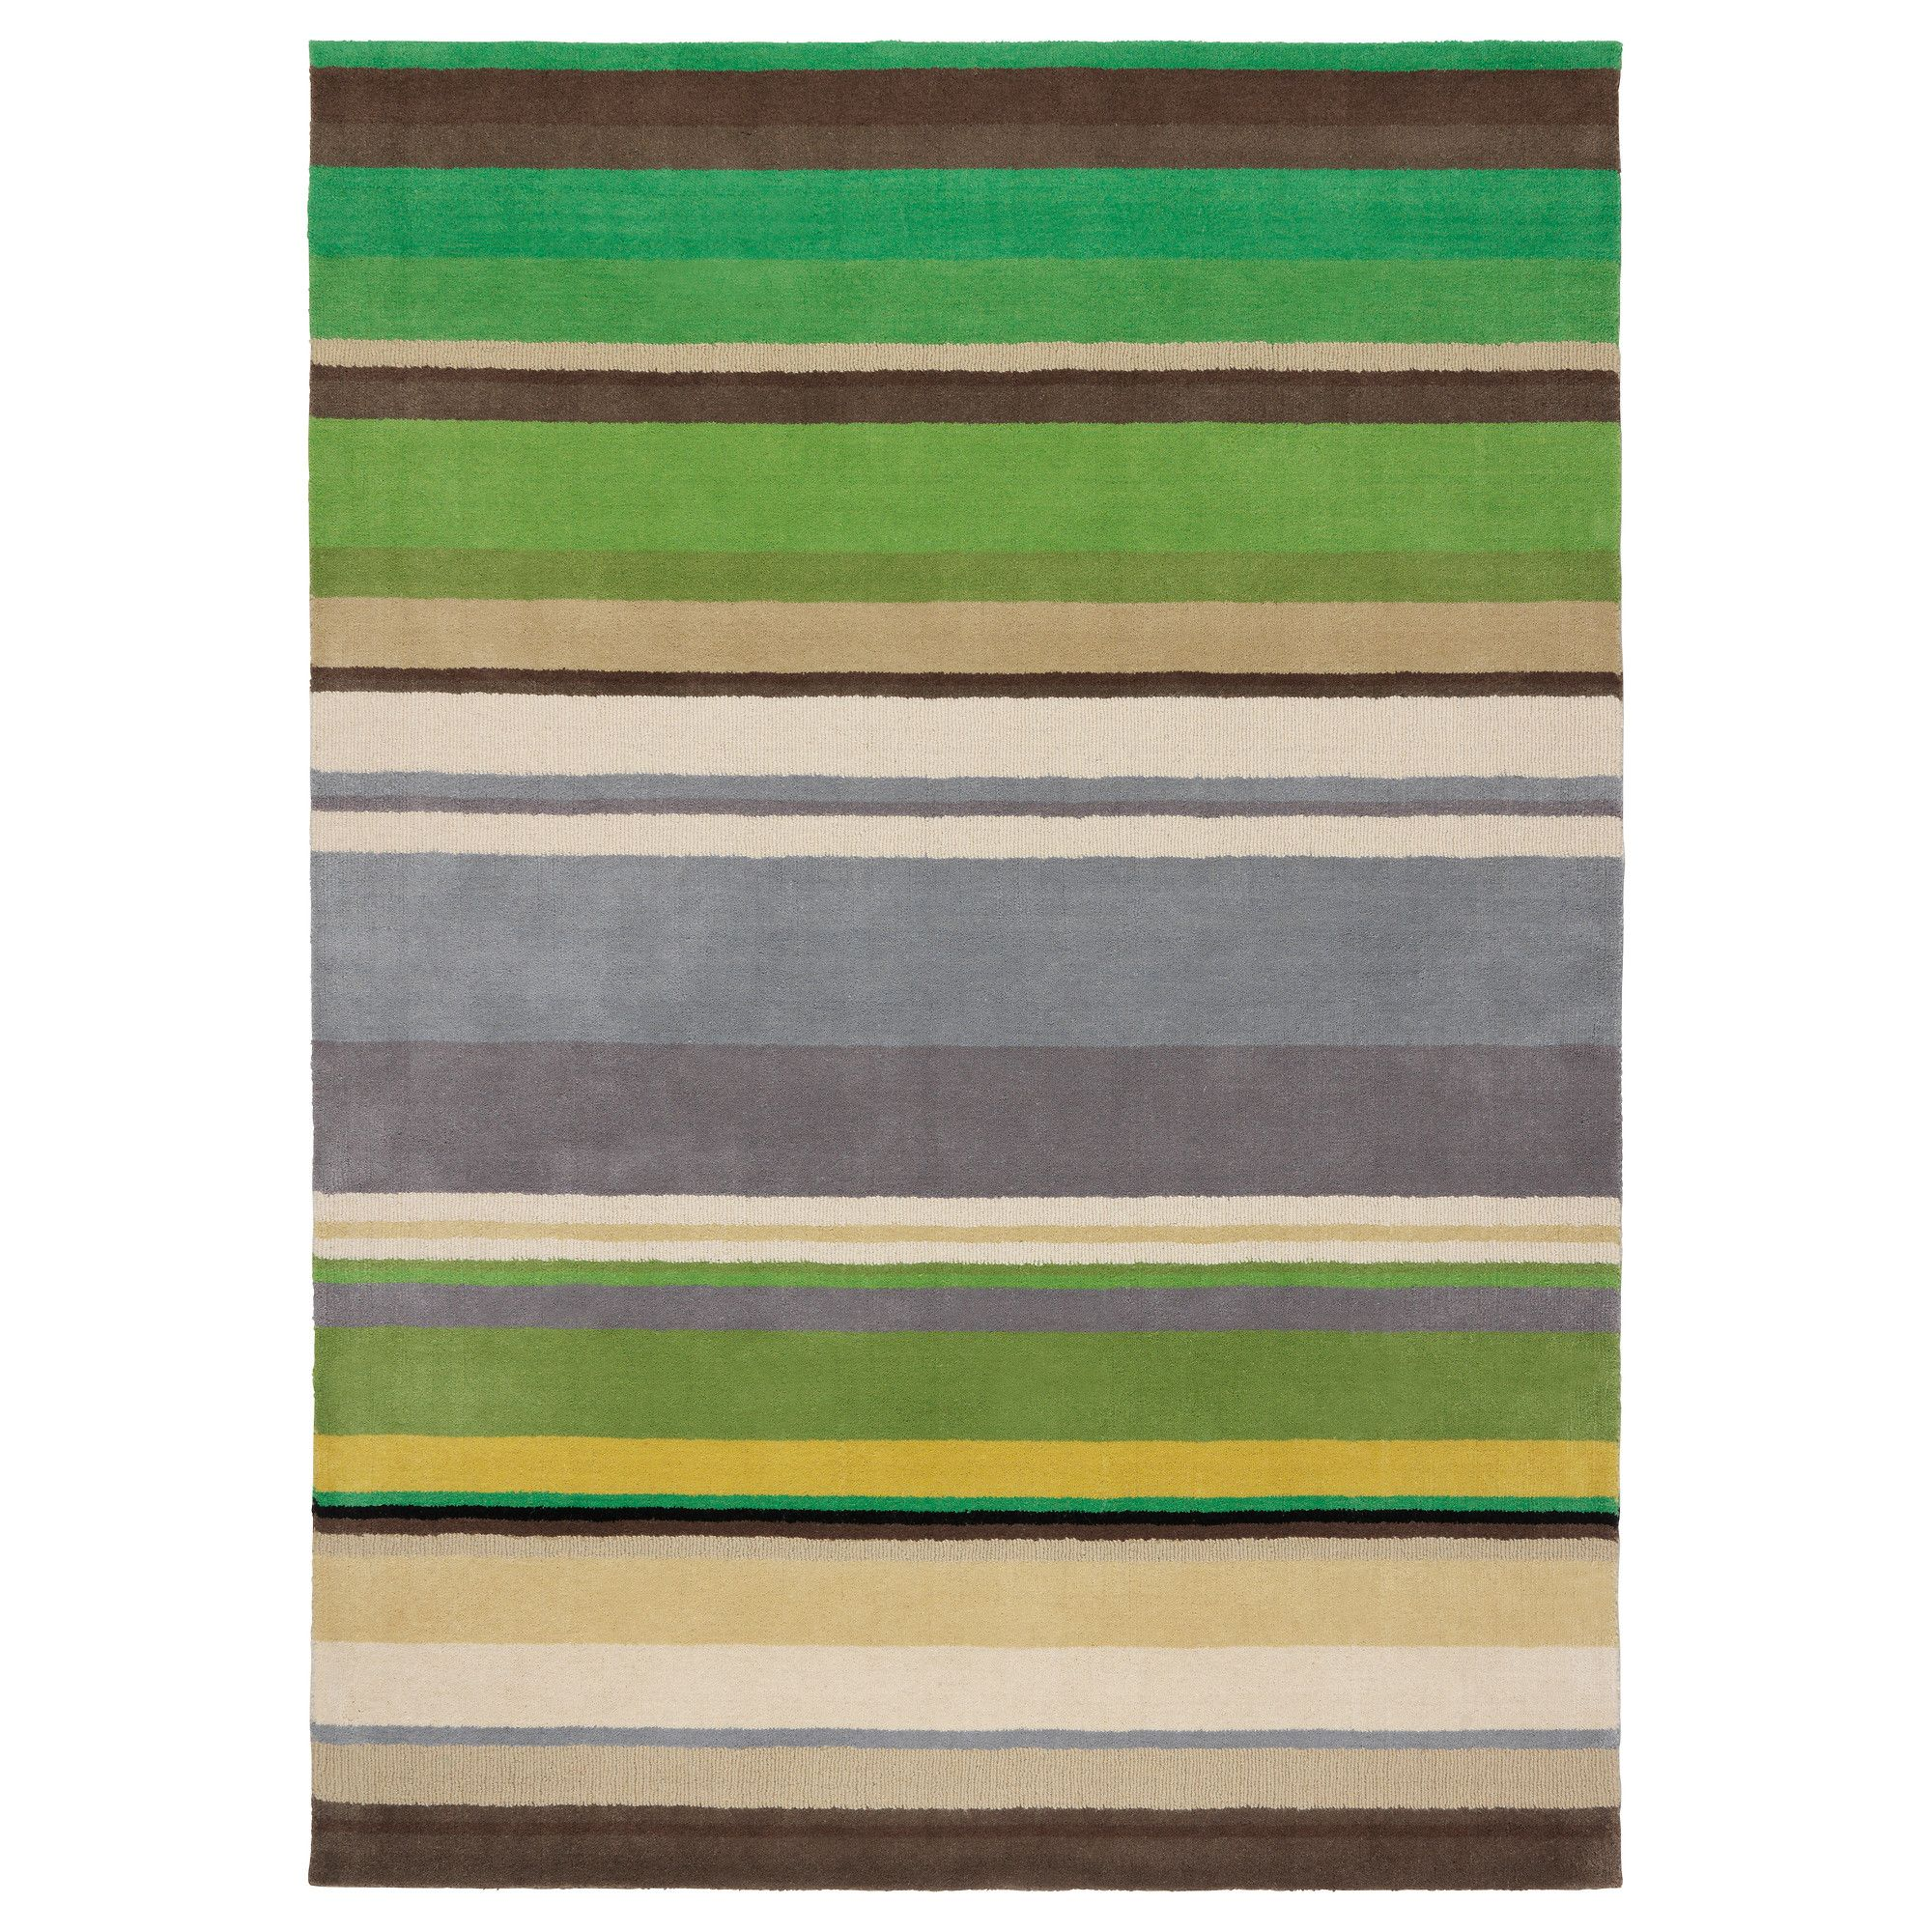 Ikea Rug Size Guide Usa: STOCKHOLM Rug, Low Pile, Green Handmade Green